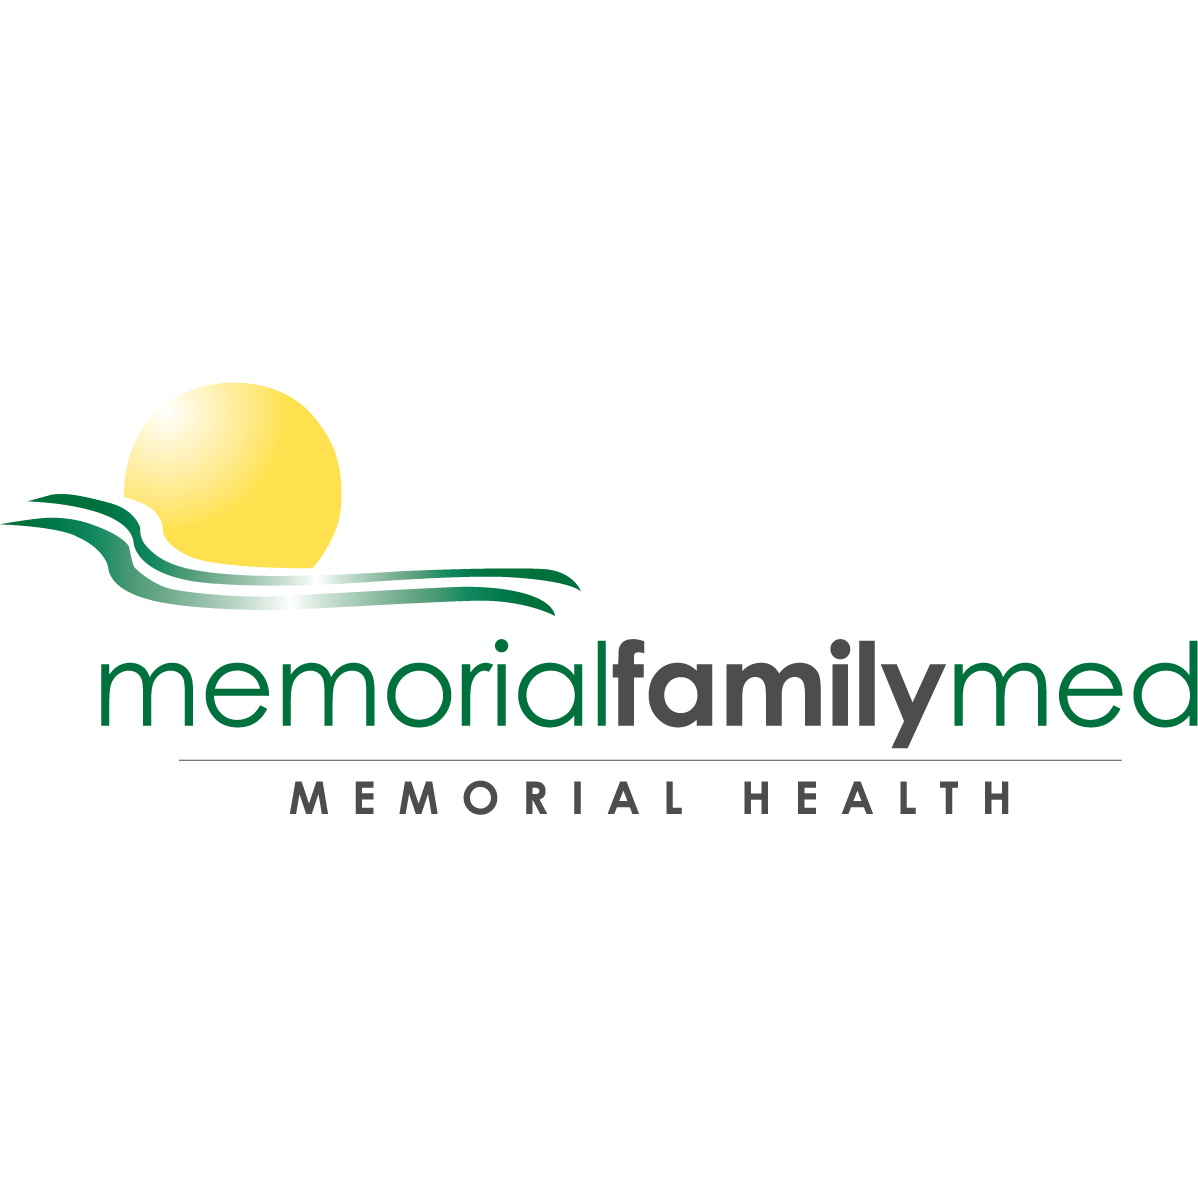 Memorial Family Medicine - San Jose - Jacksonville, FL - General or Family Practice Physicians